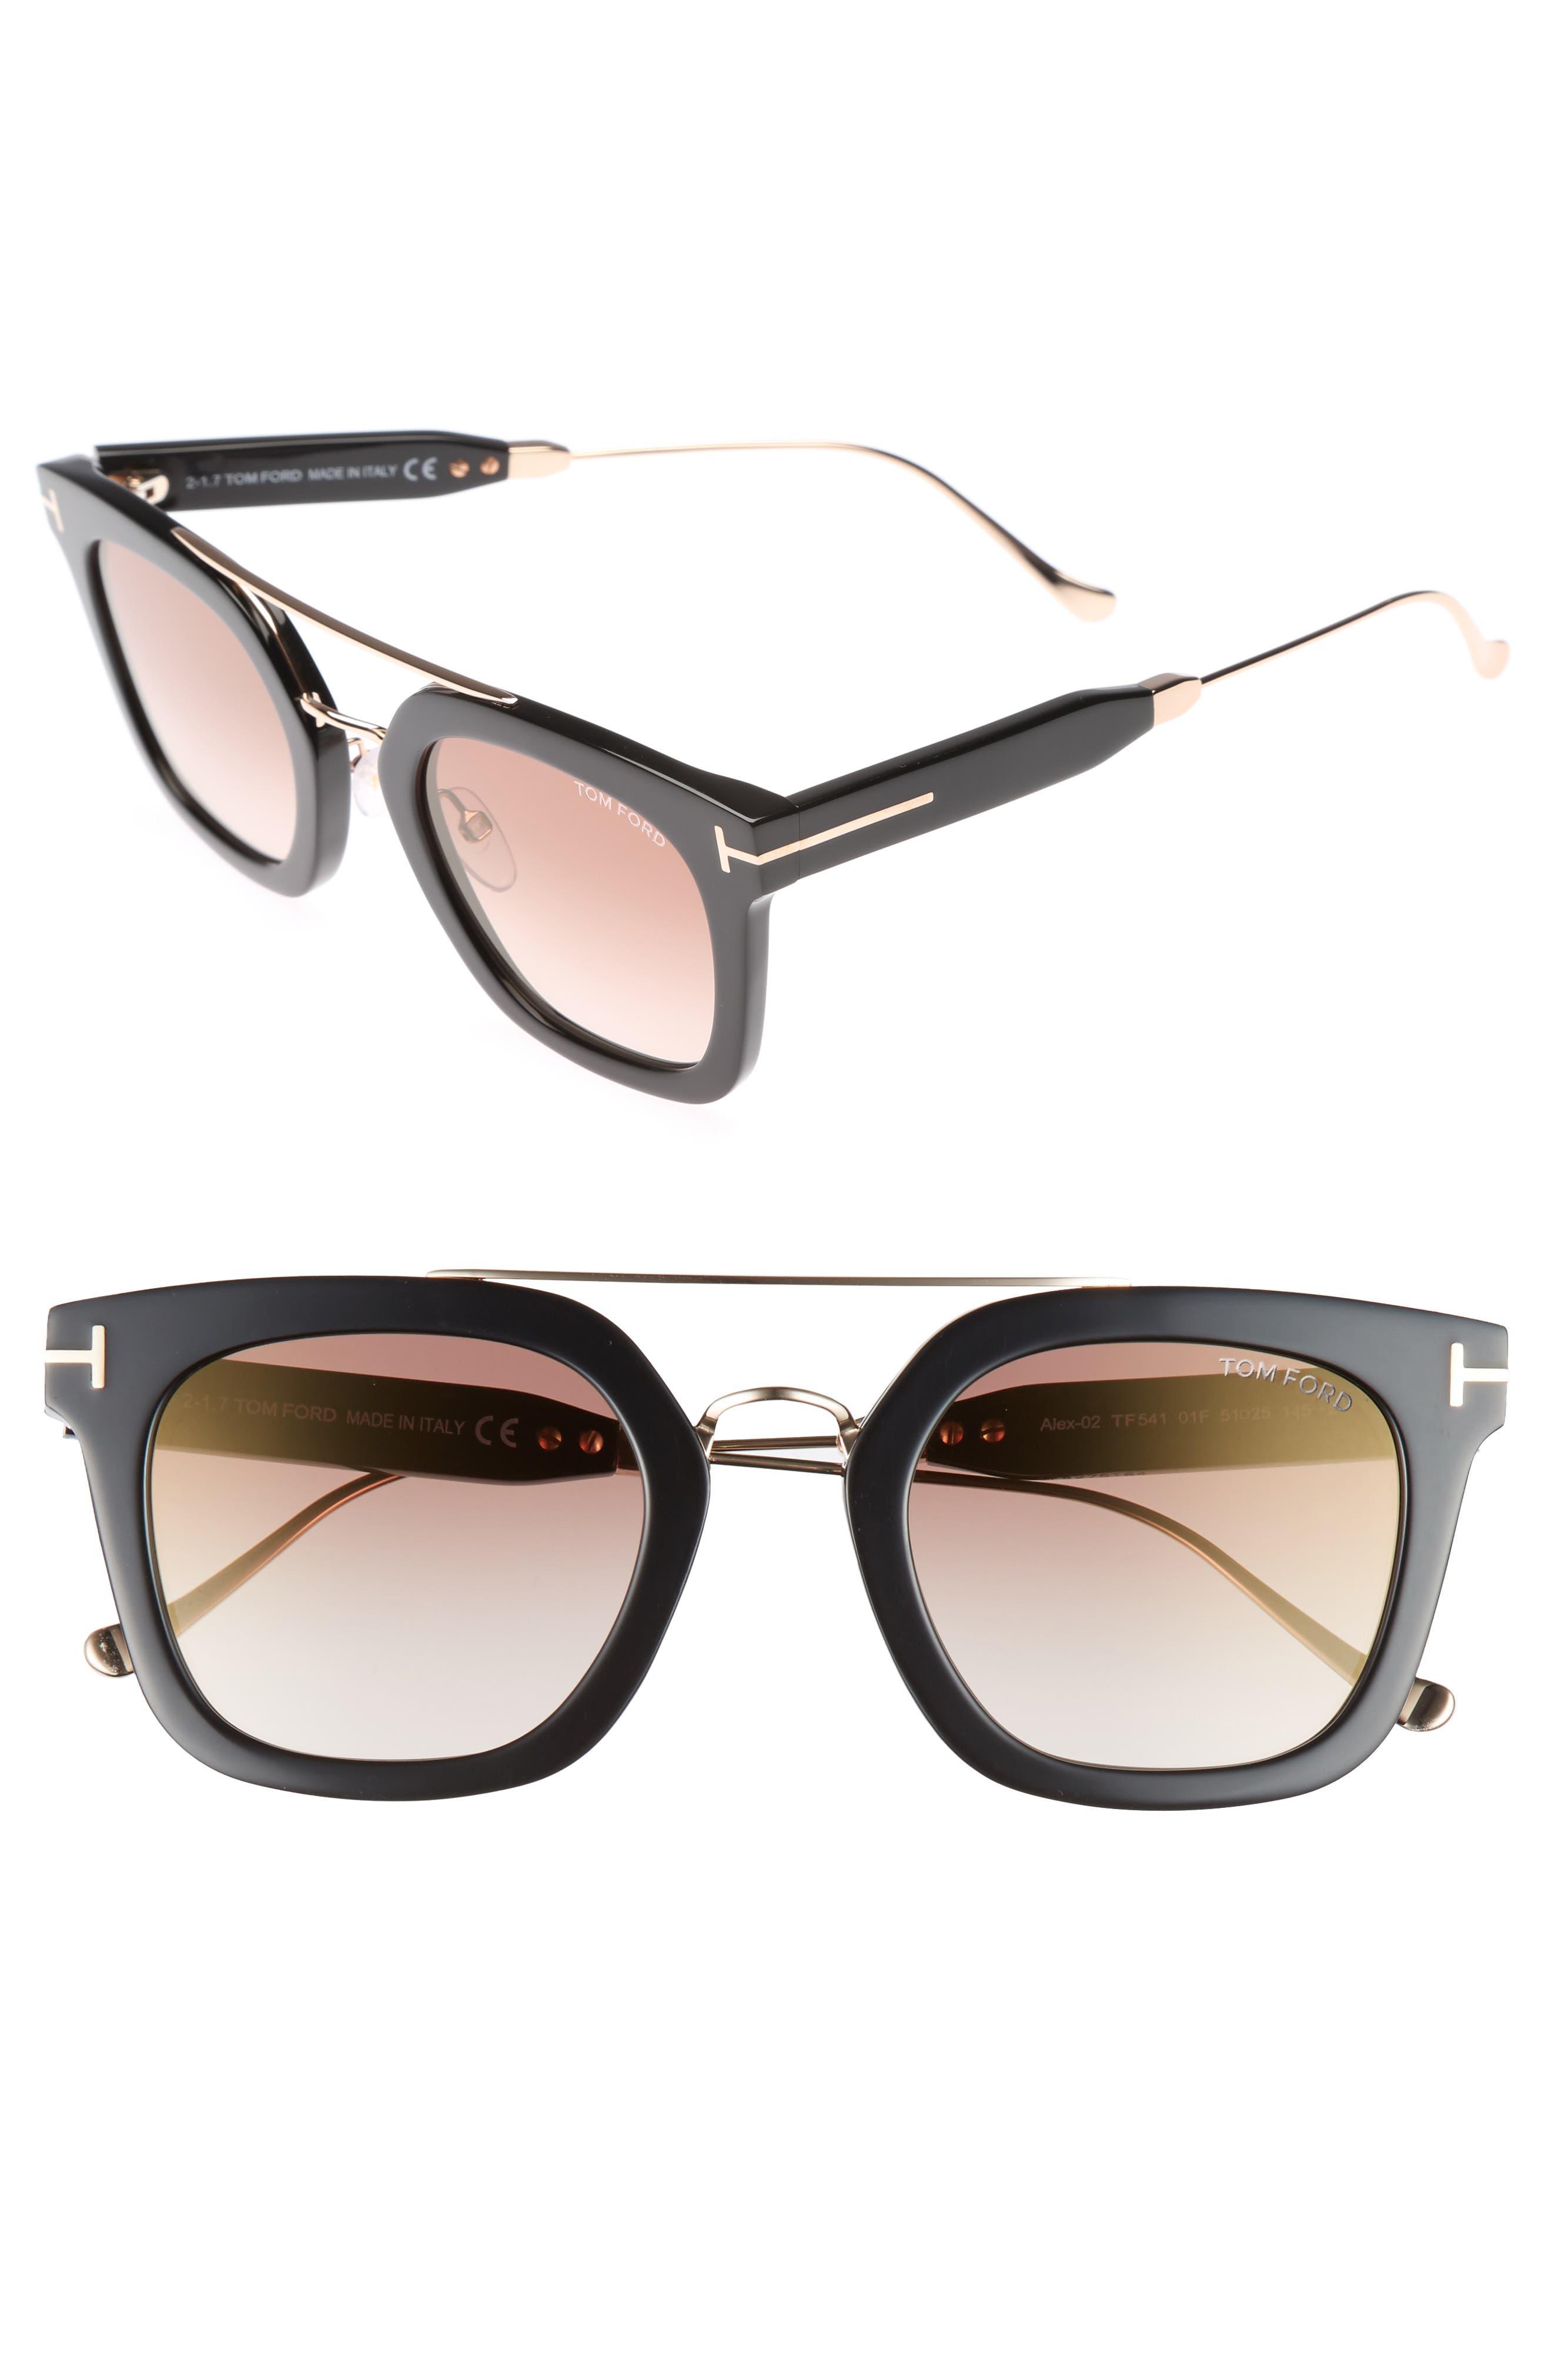 Alex 51mm Sunglasses,                             Main thumbnail 1, color,                             001